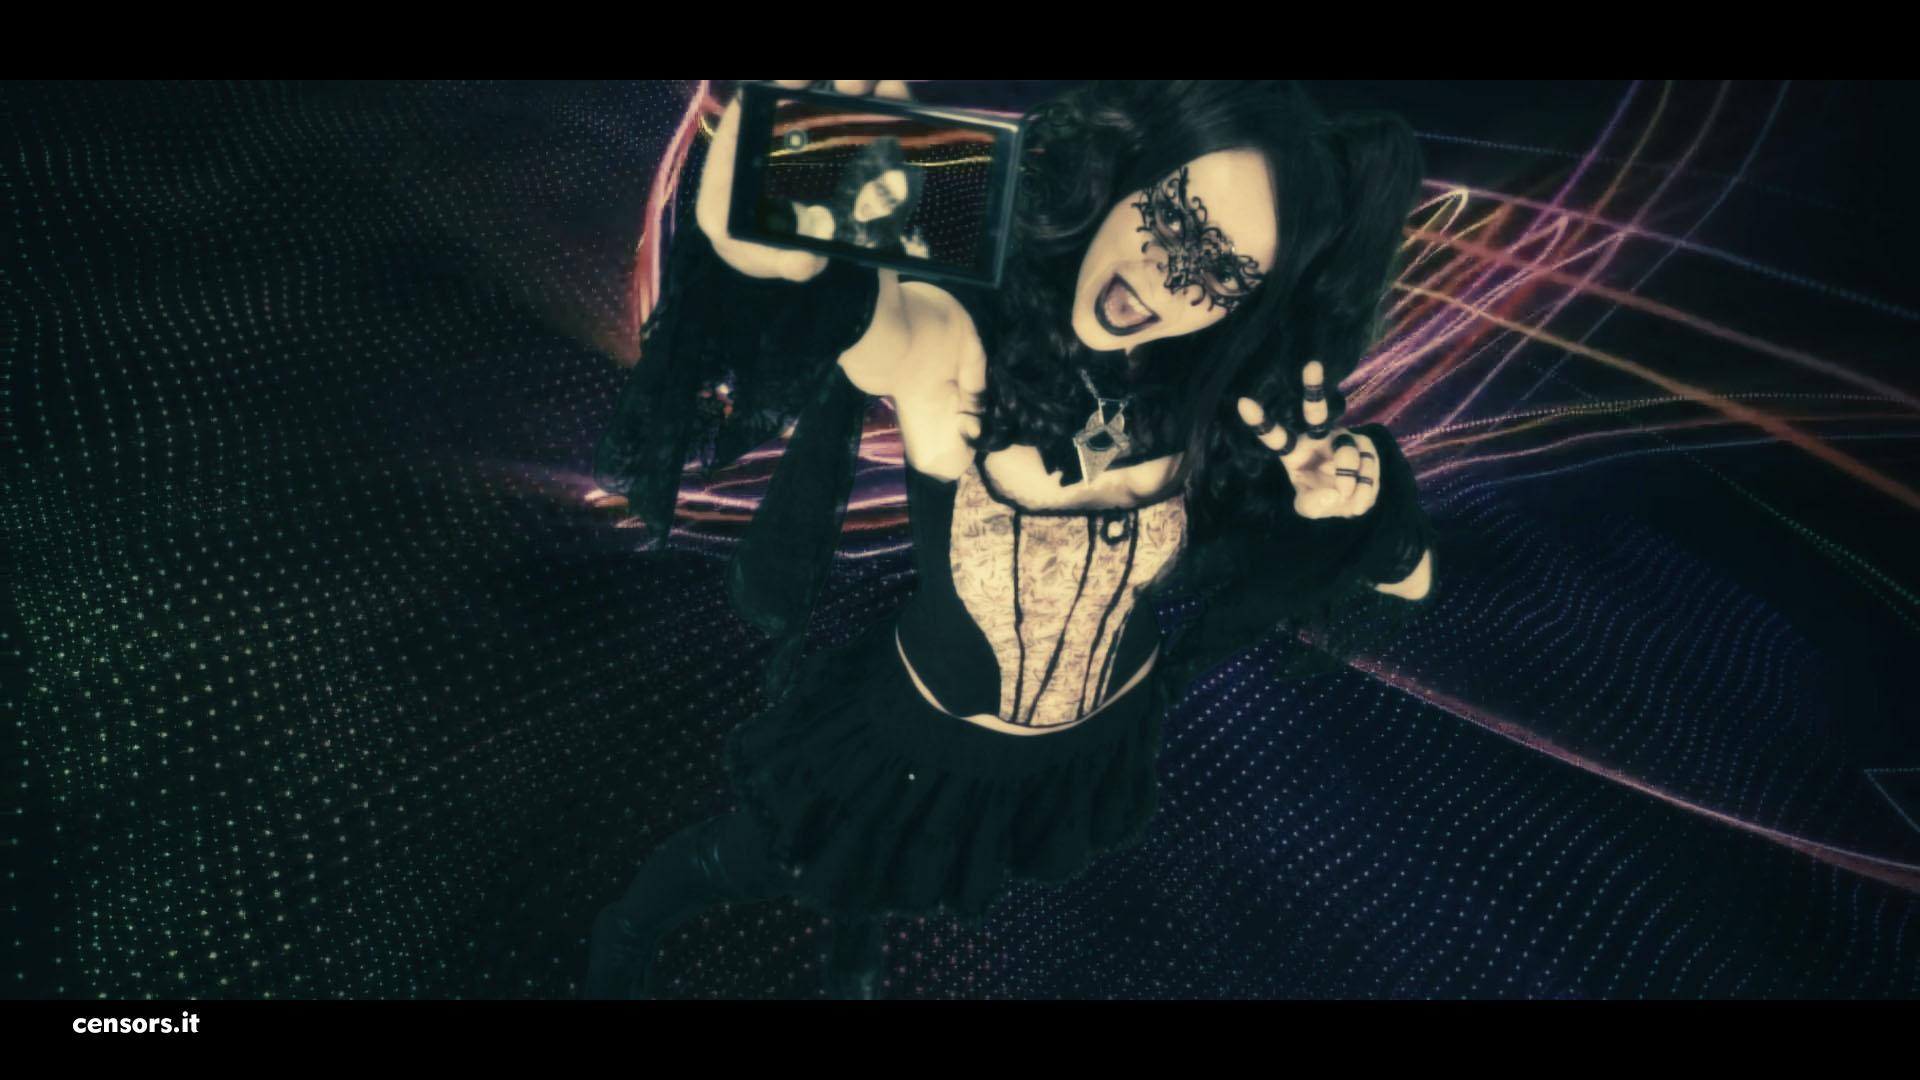 Censors - Fotogrammi Awakening - 12